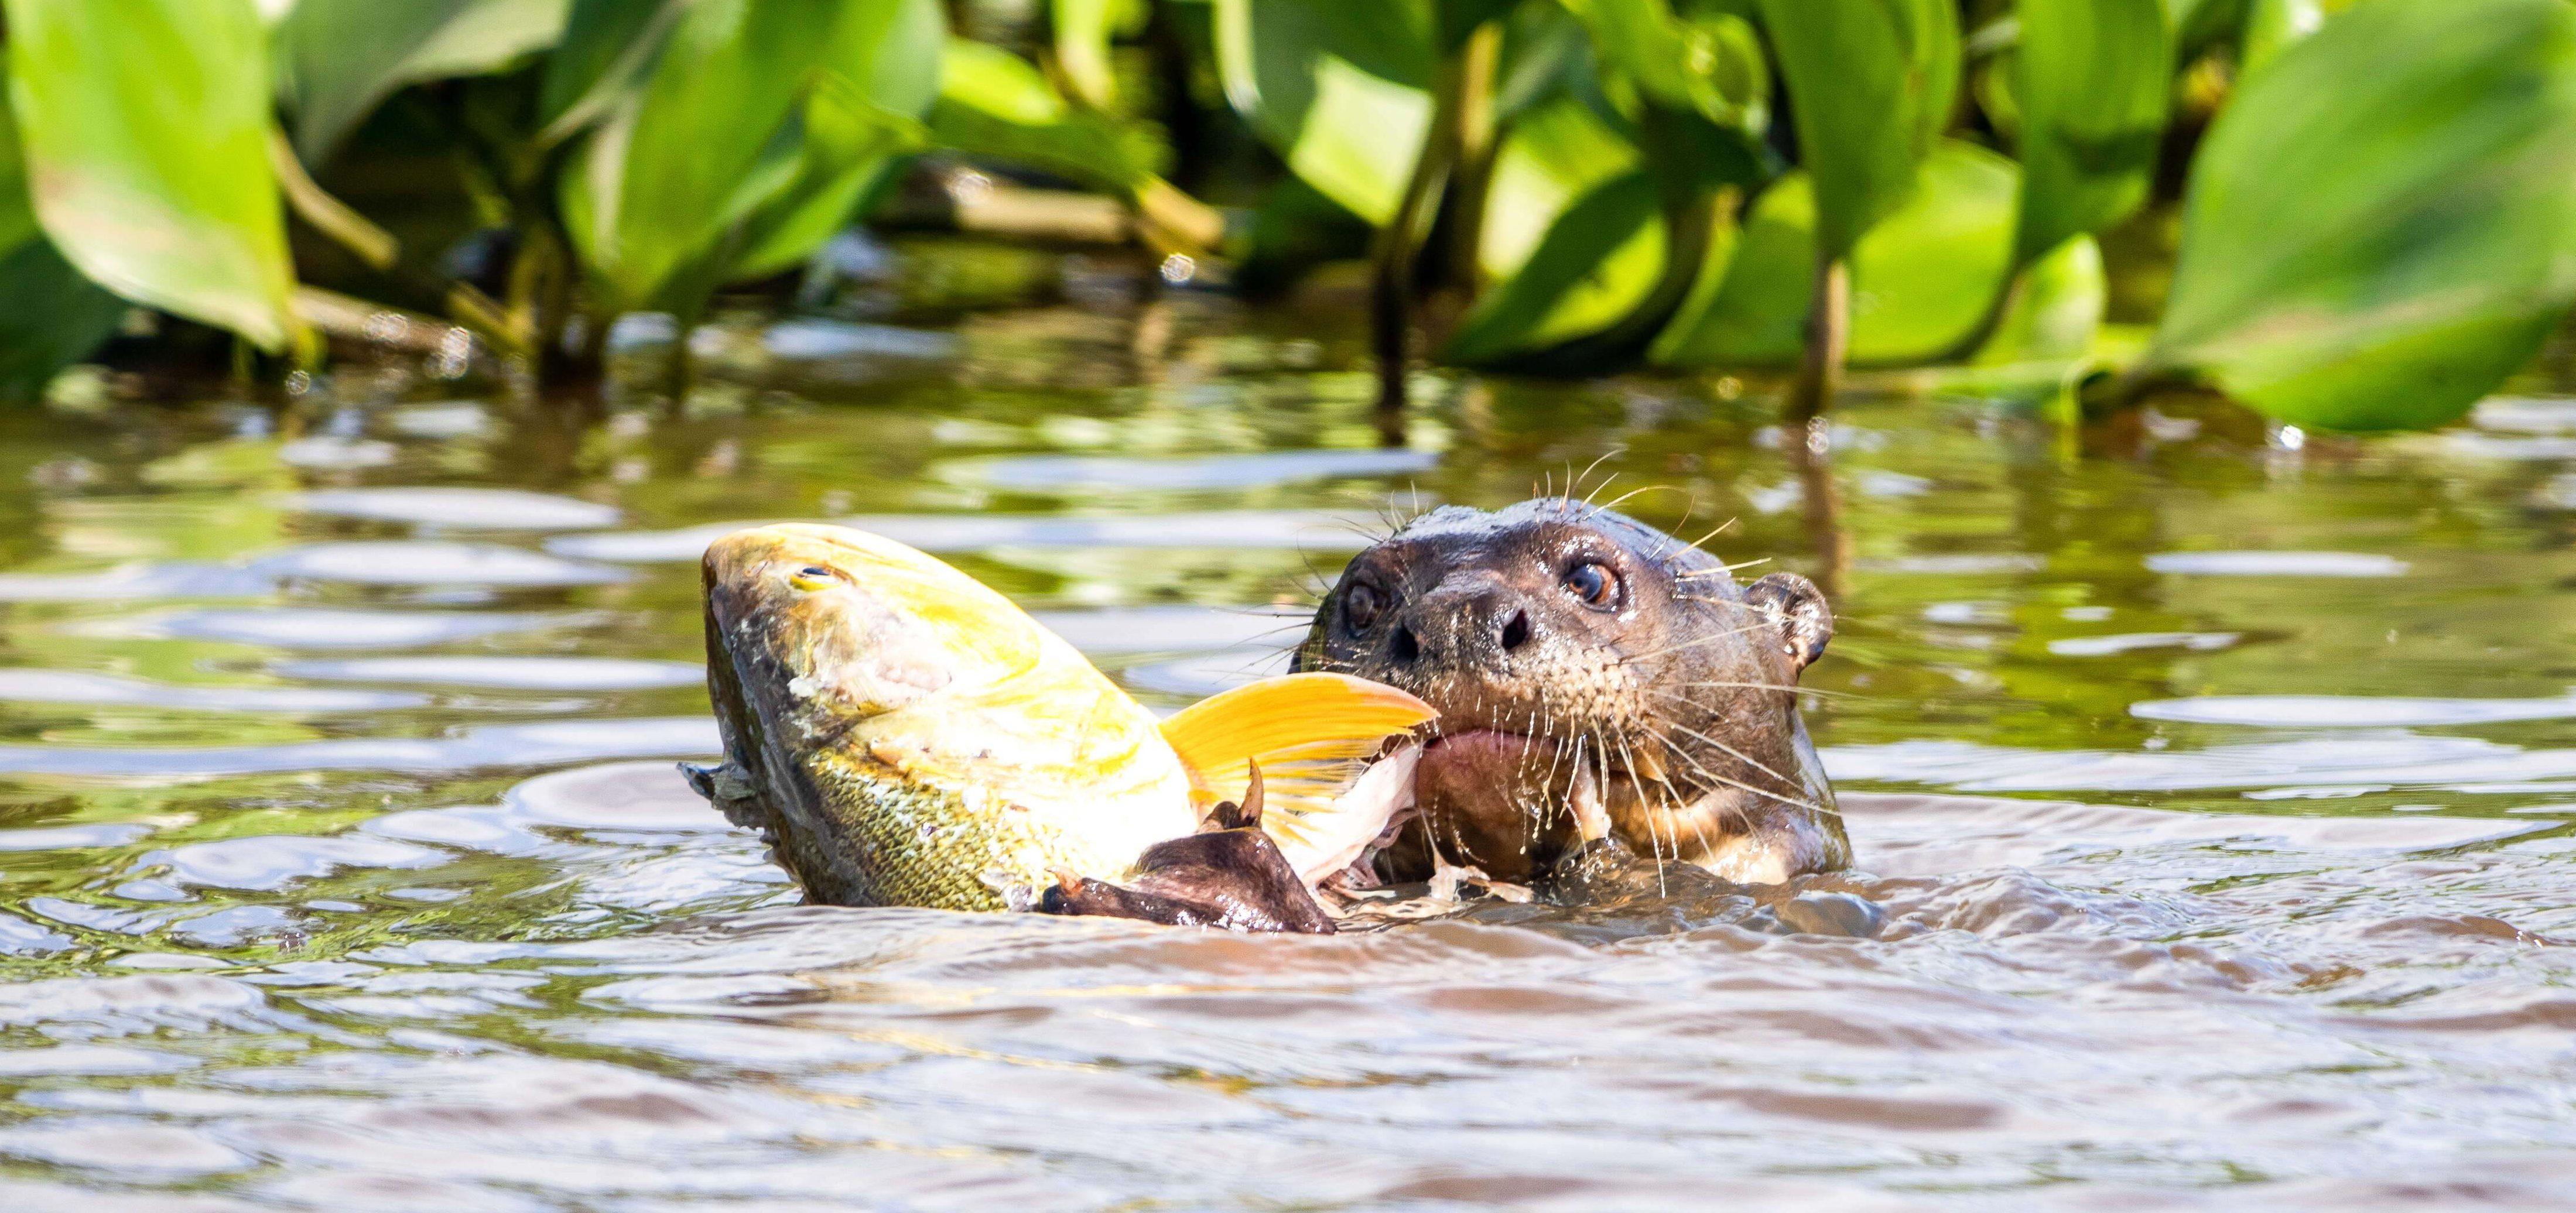 Otter Pantanal